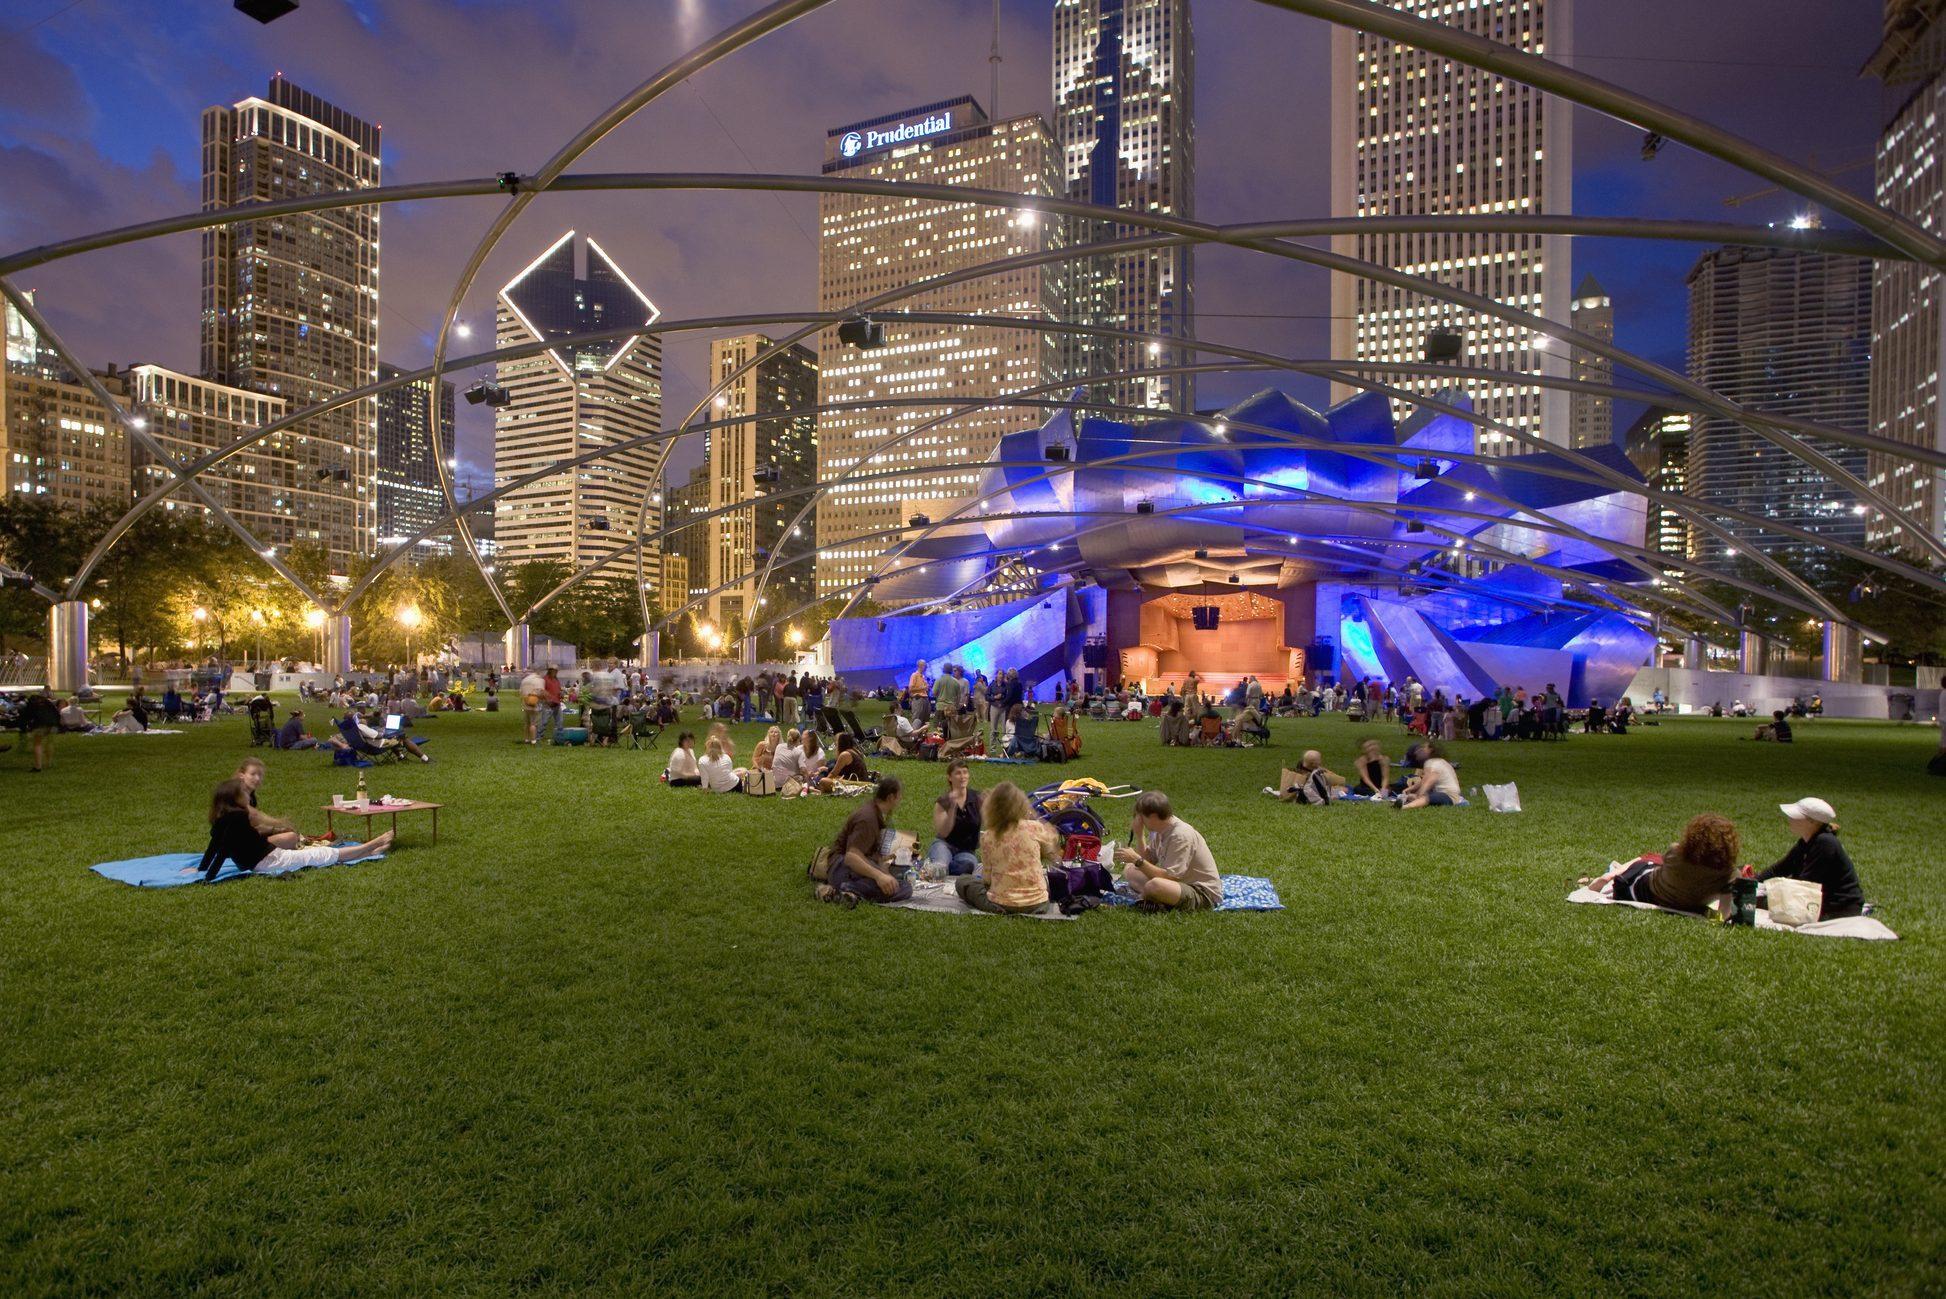 Jay Pritzker Pavillon at Millennium Park, Chicago, Illinois